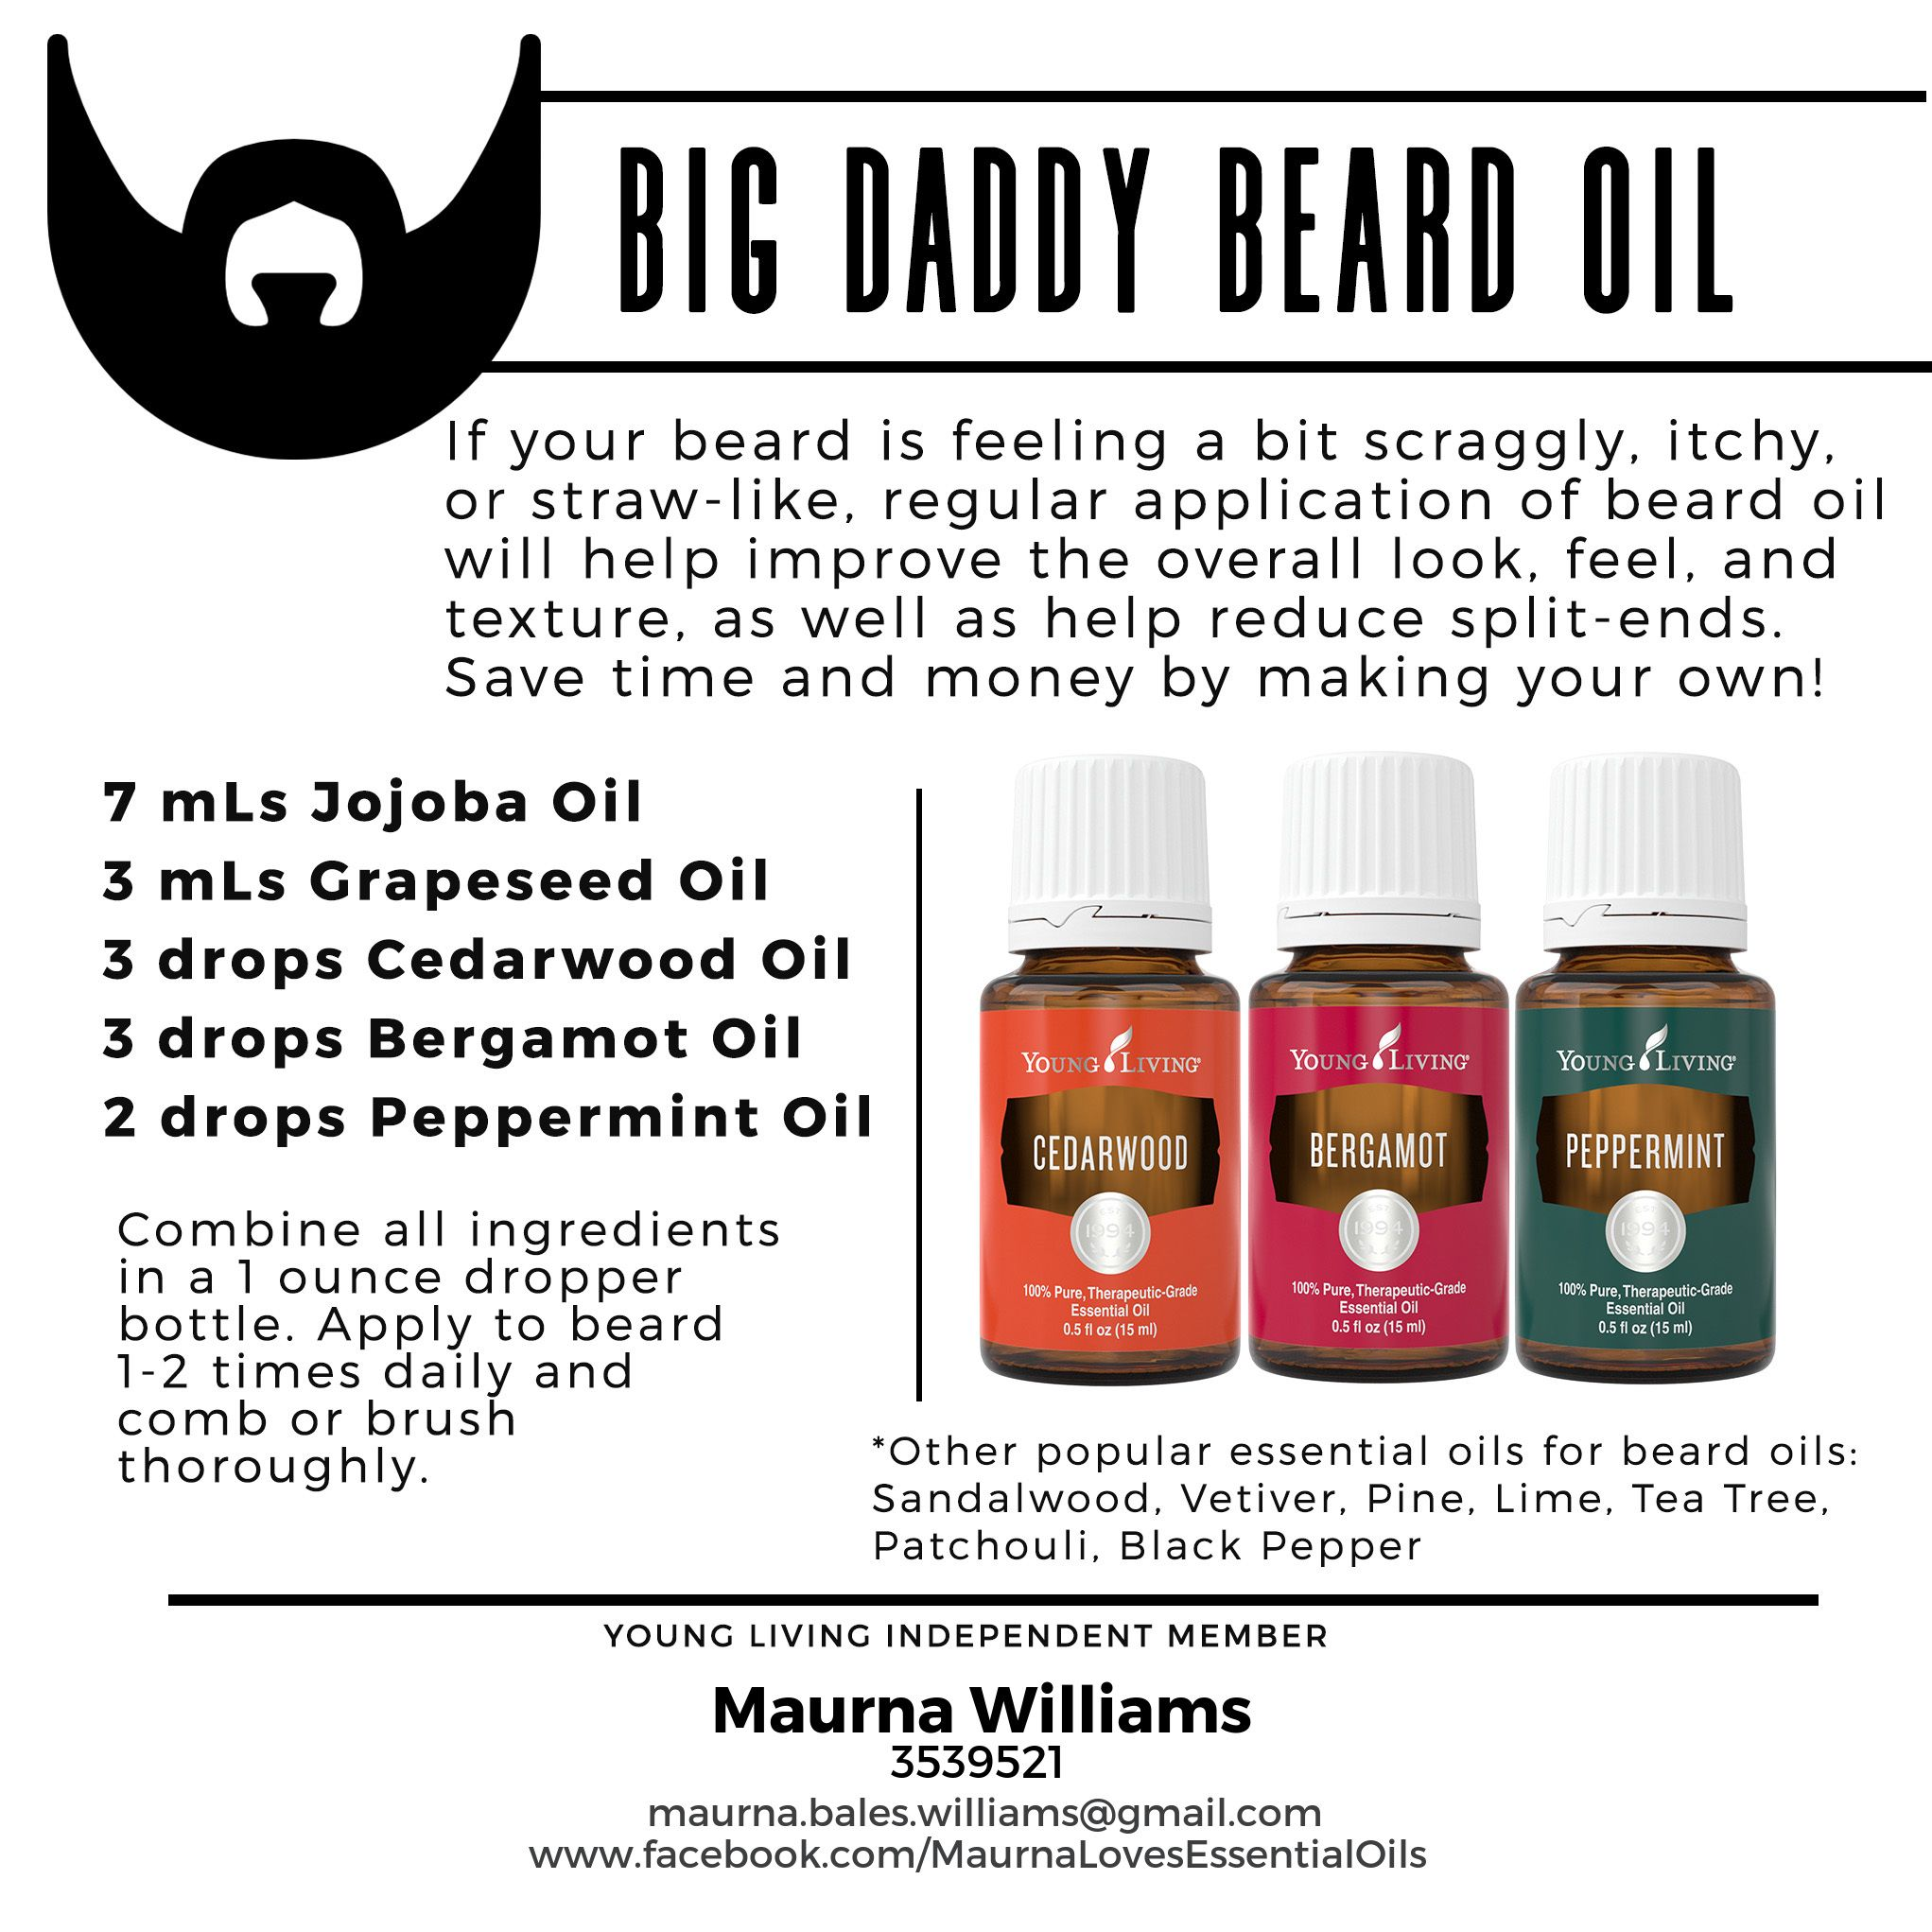 Beard Oil Young Living Essential Oils For Men Maurna